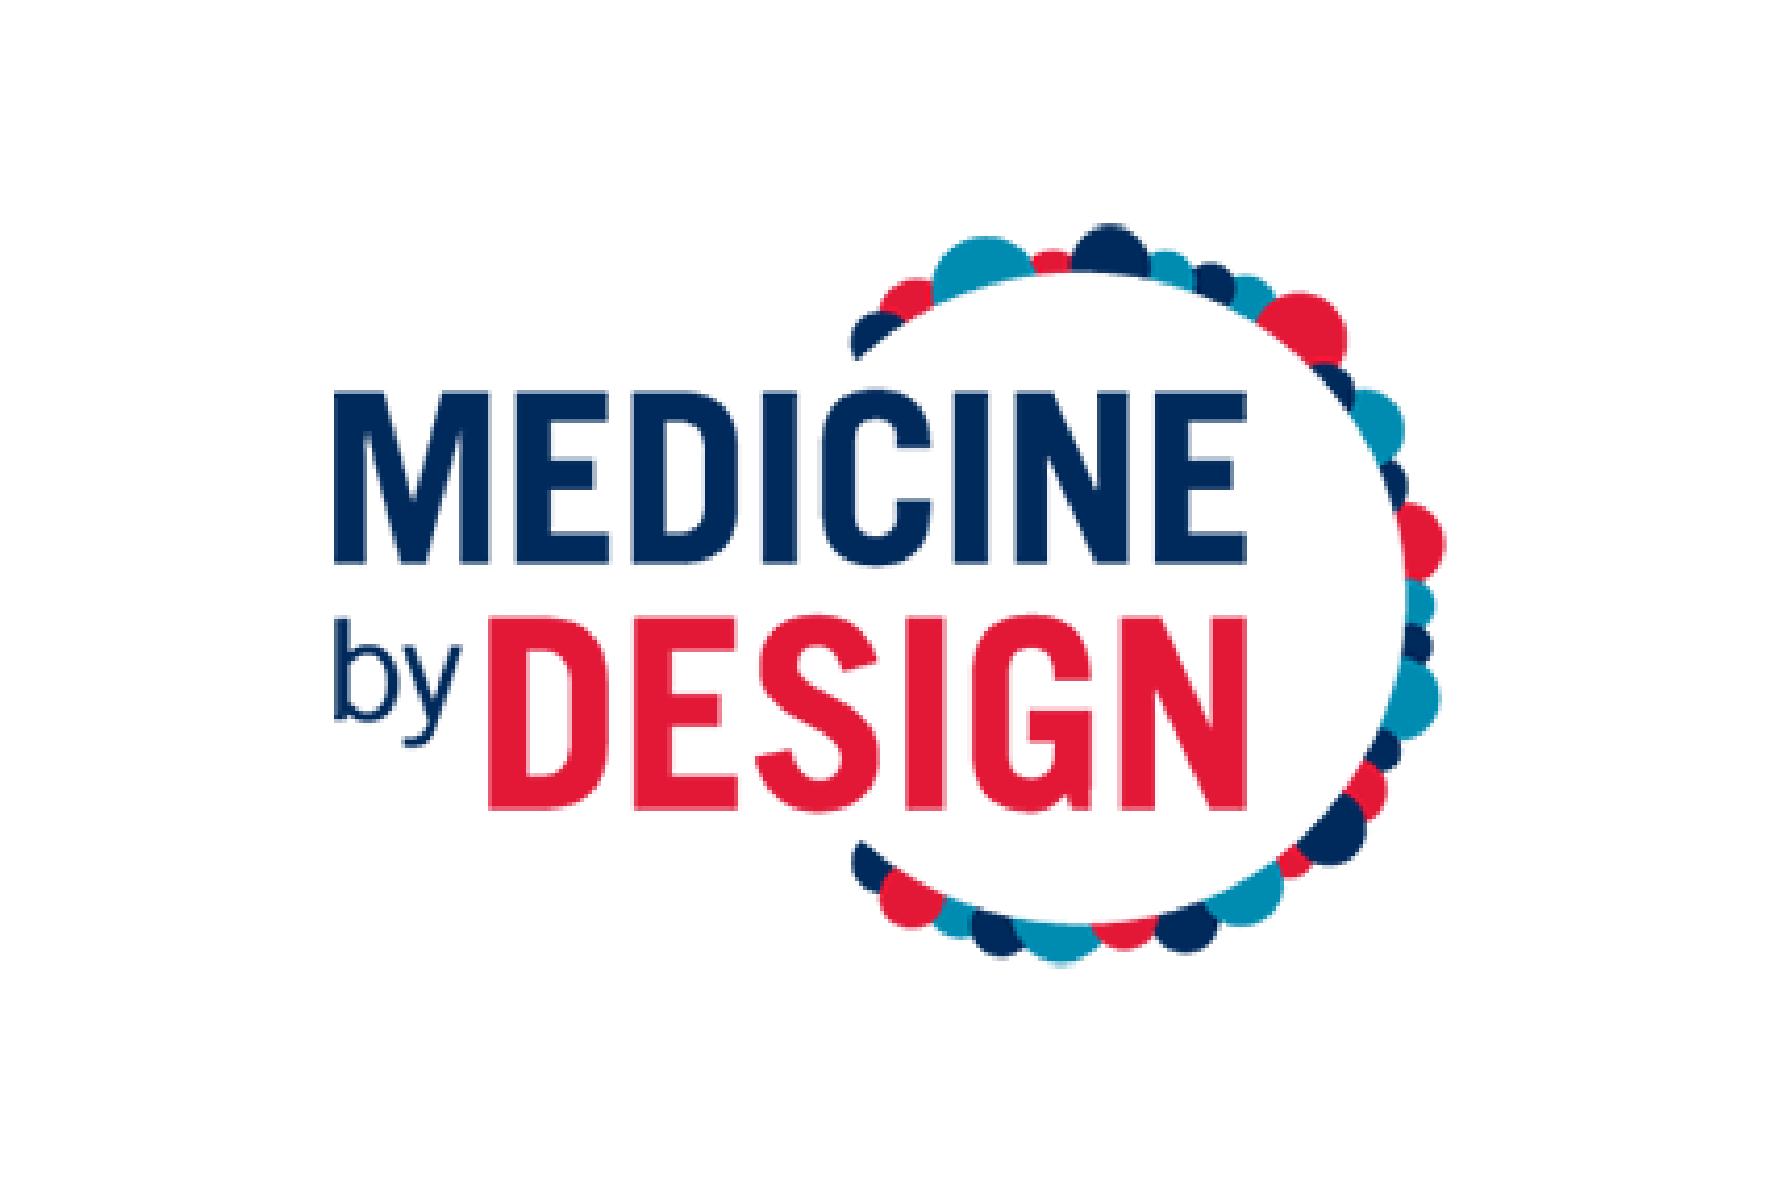 Medicine_By_Design 3w x 2h.png